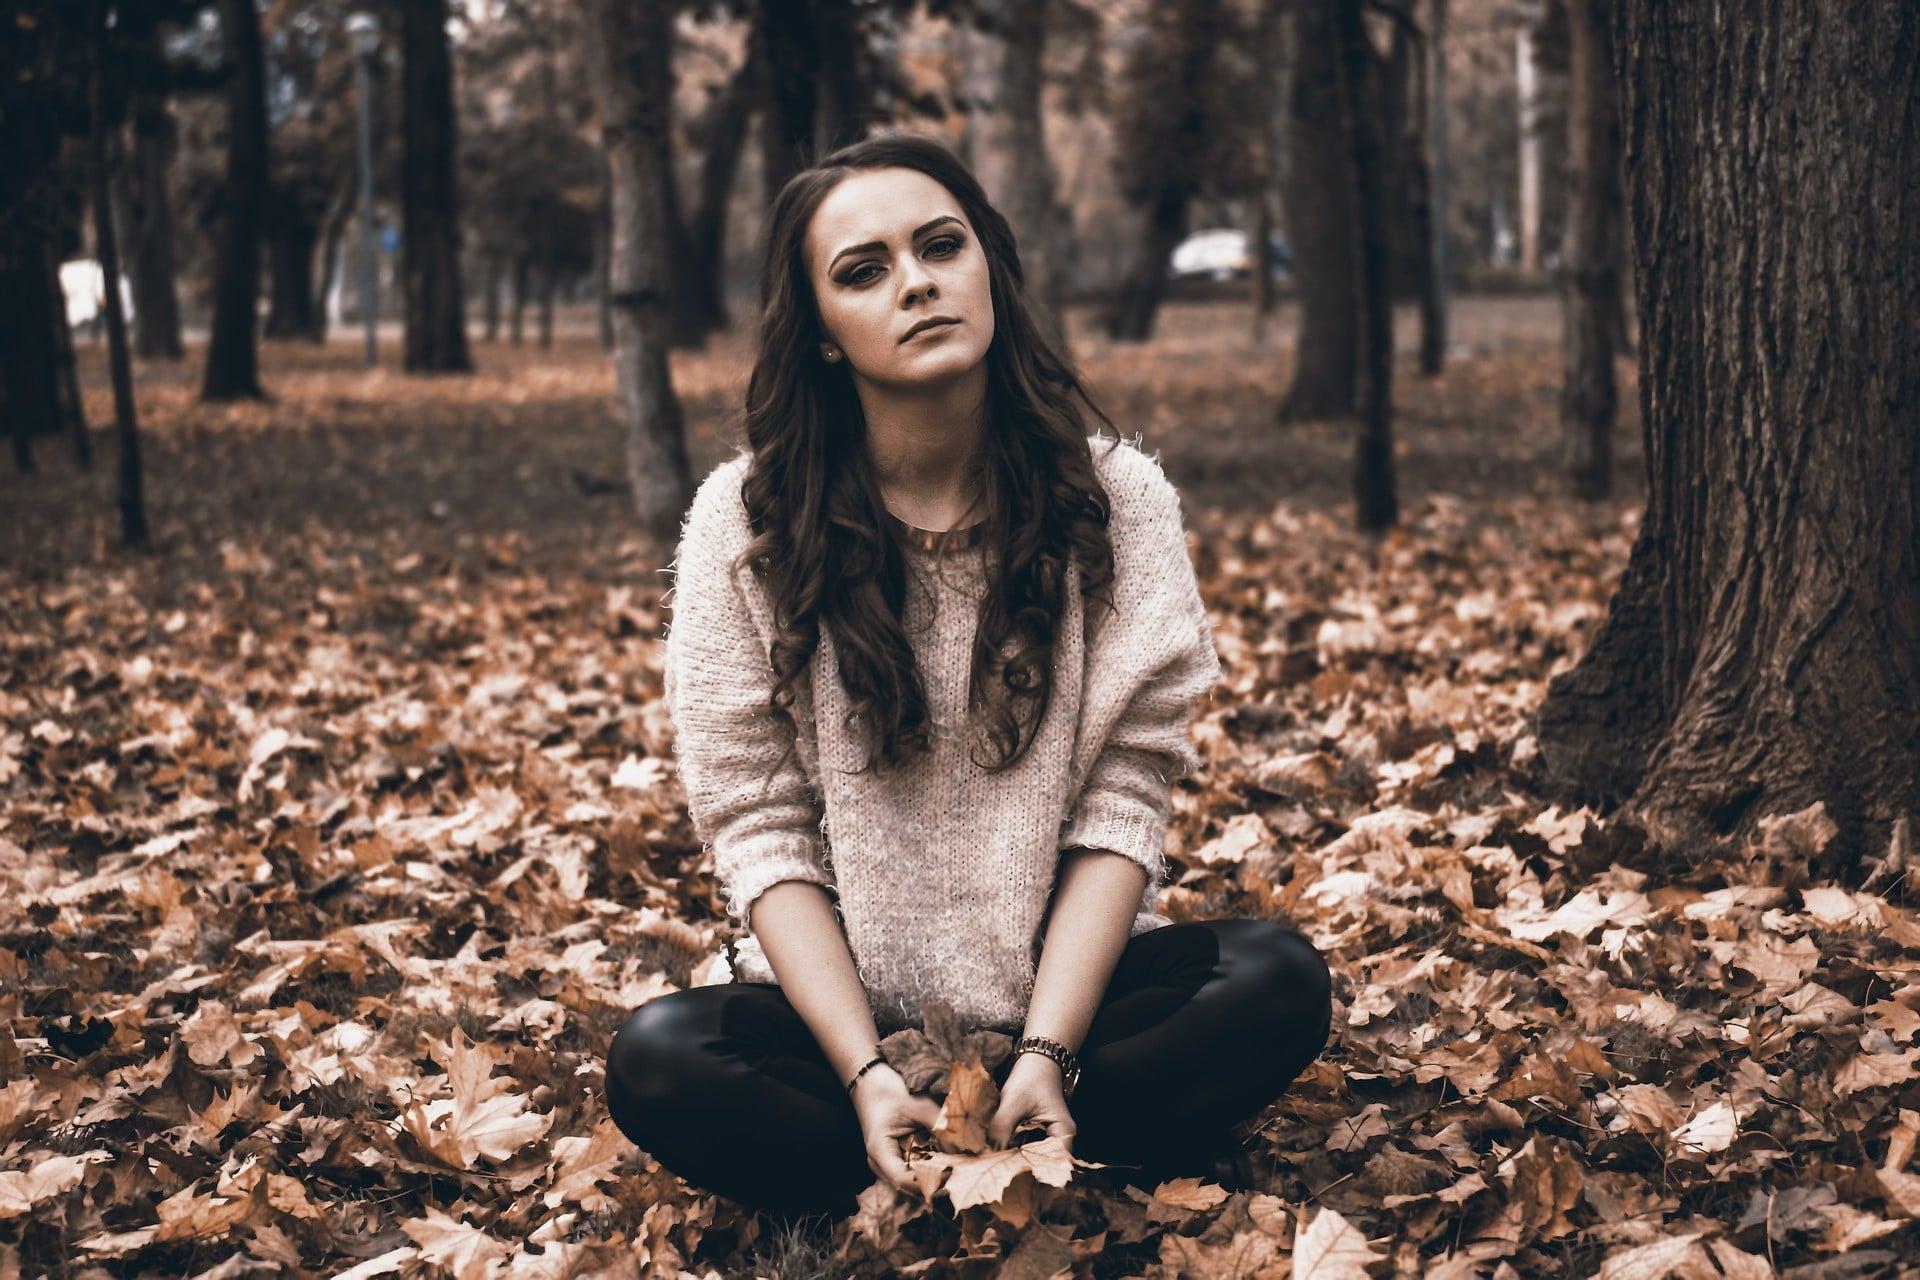 Mourning jewelry | Sad woman